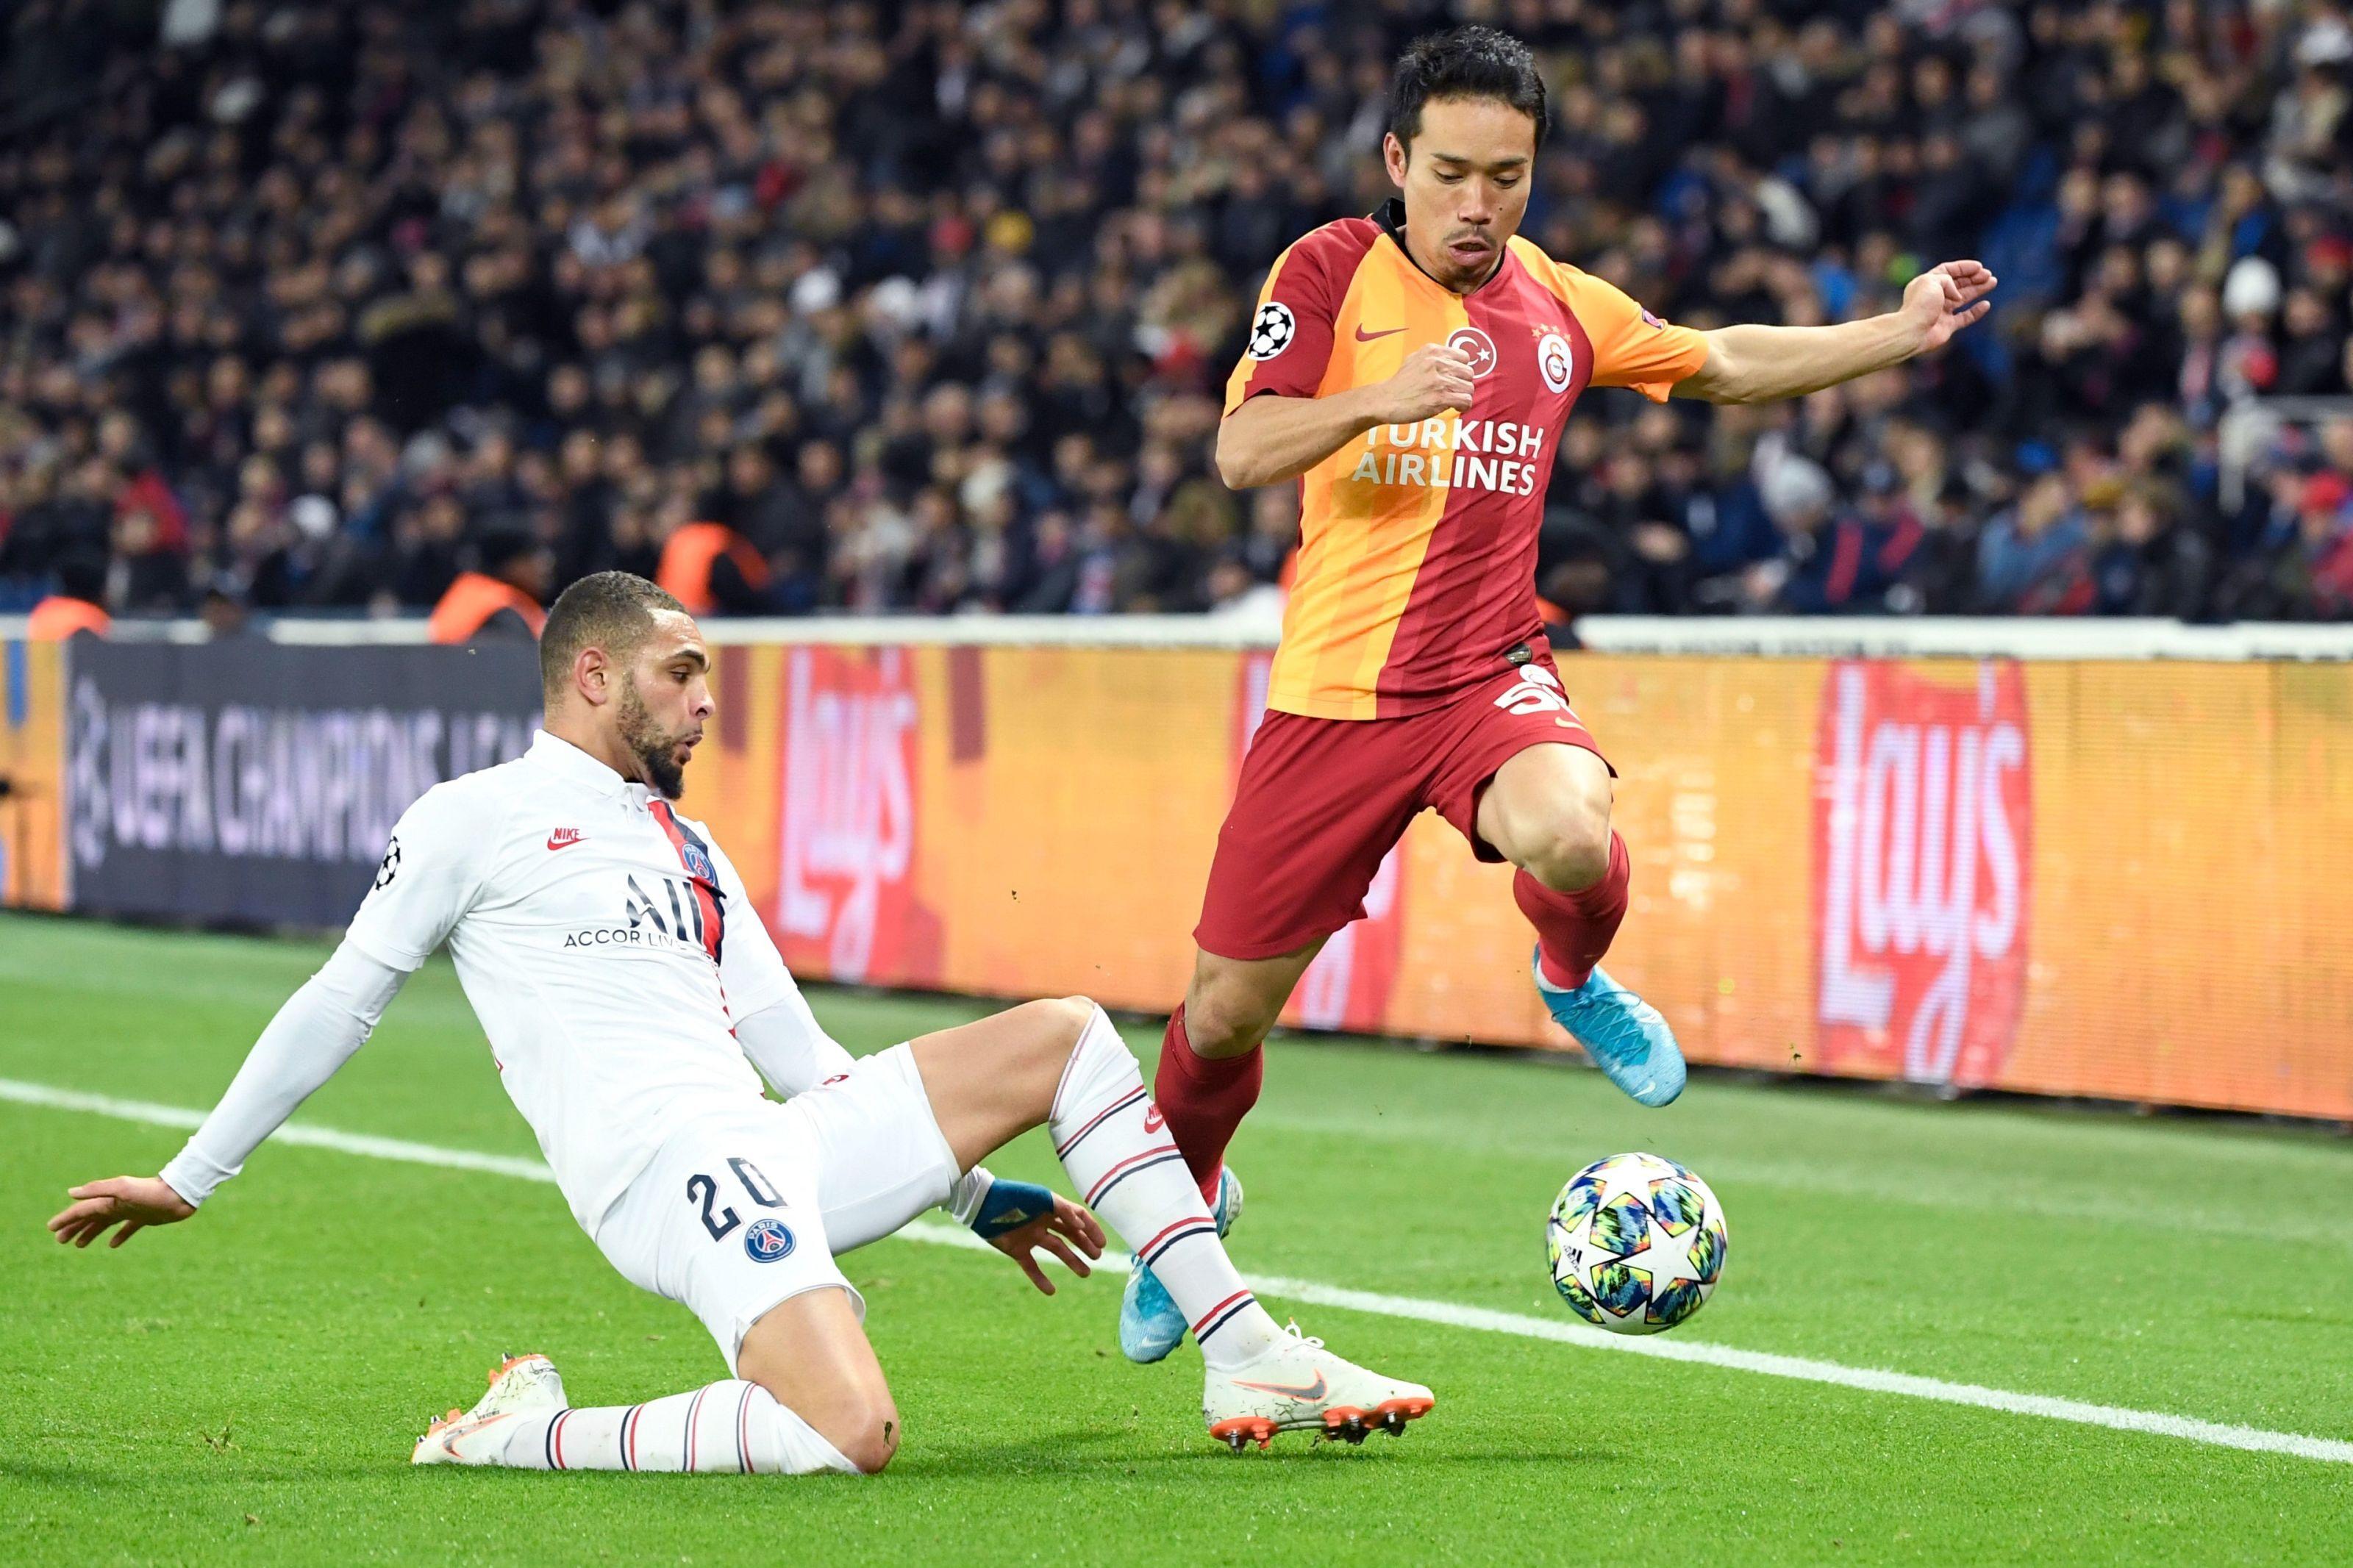 Arsenal: What will Layvin Kurzawa offer to Mikel Arteta?